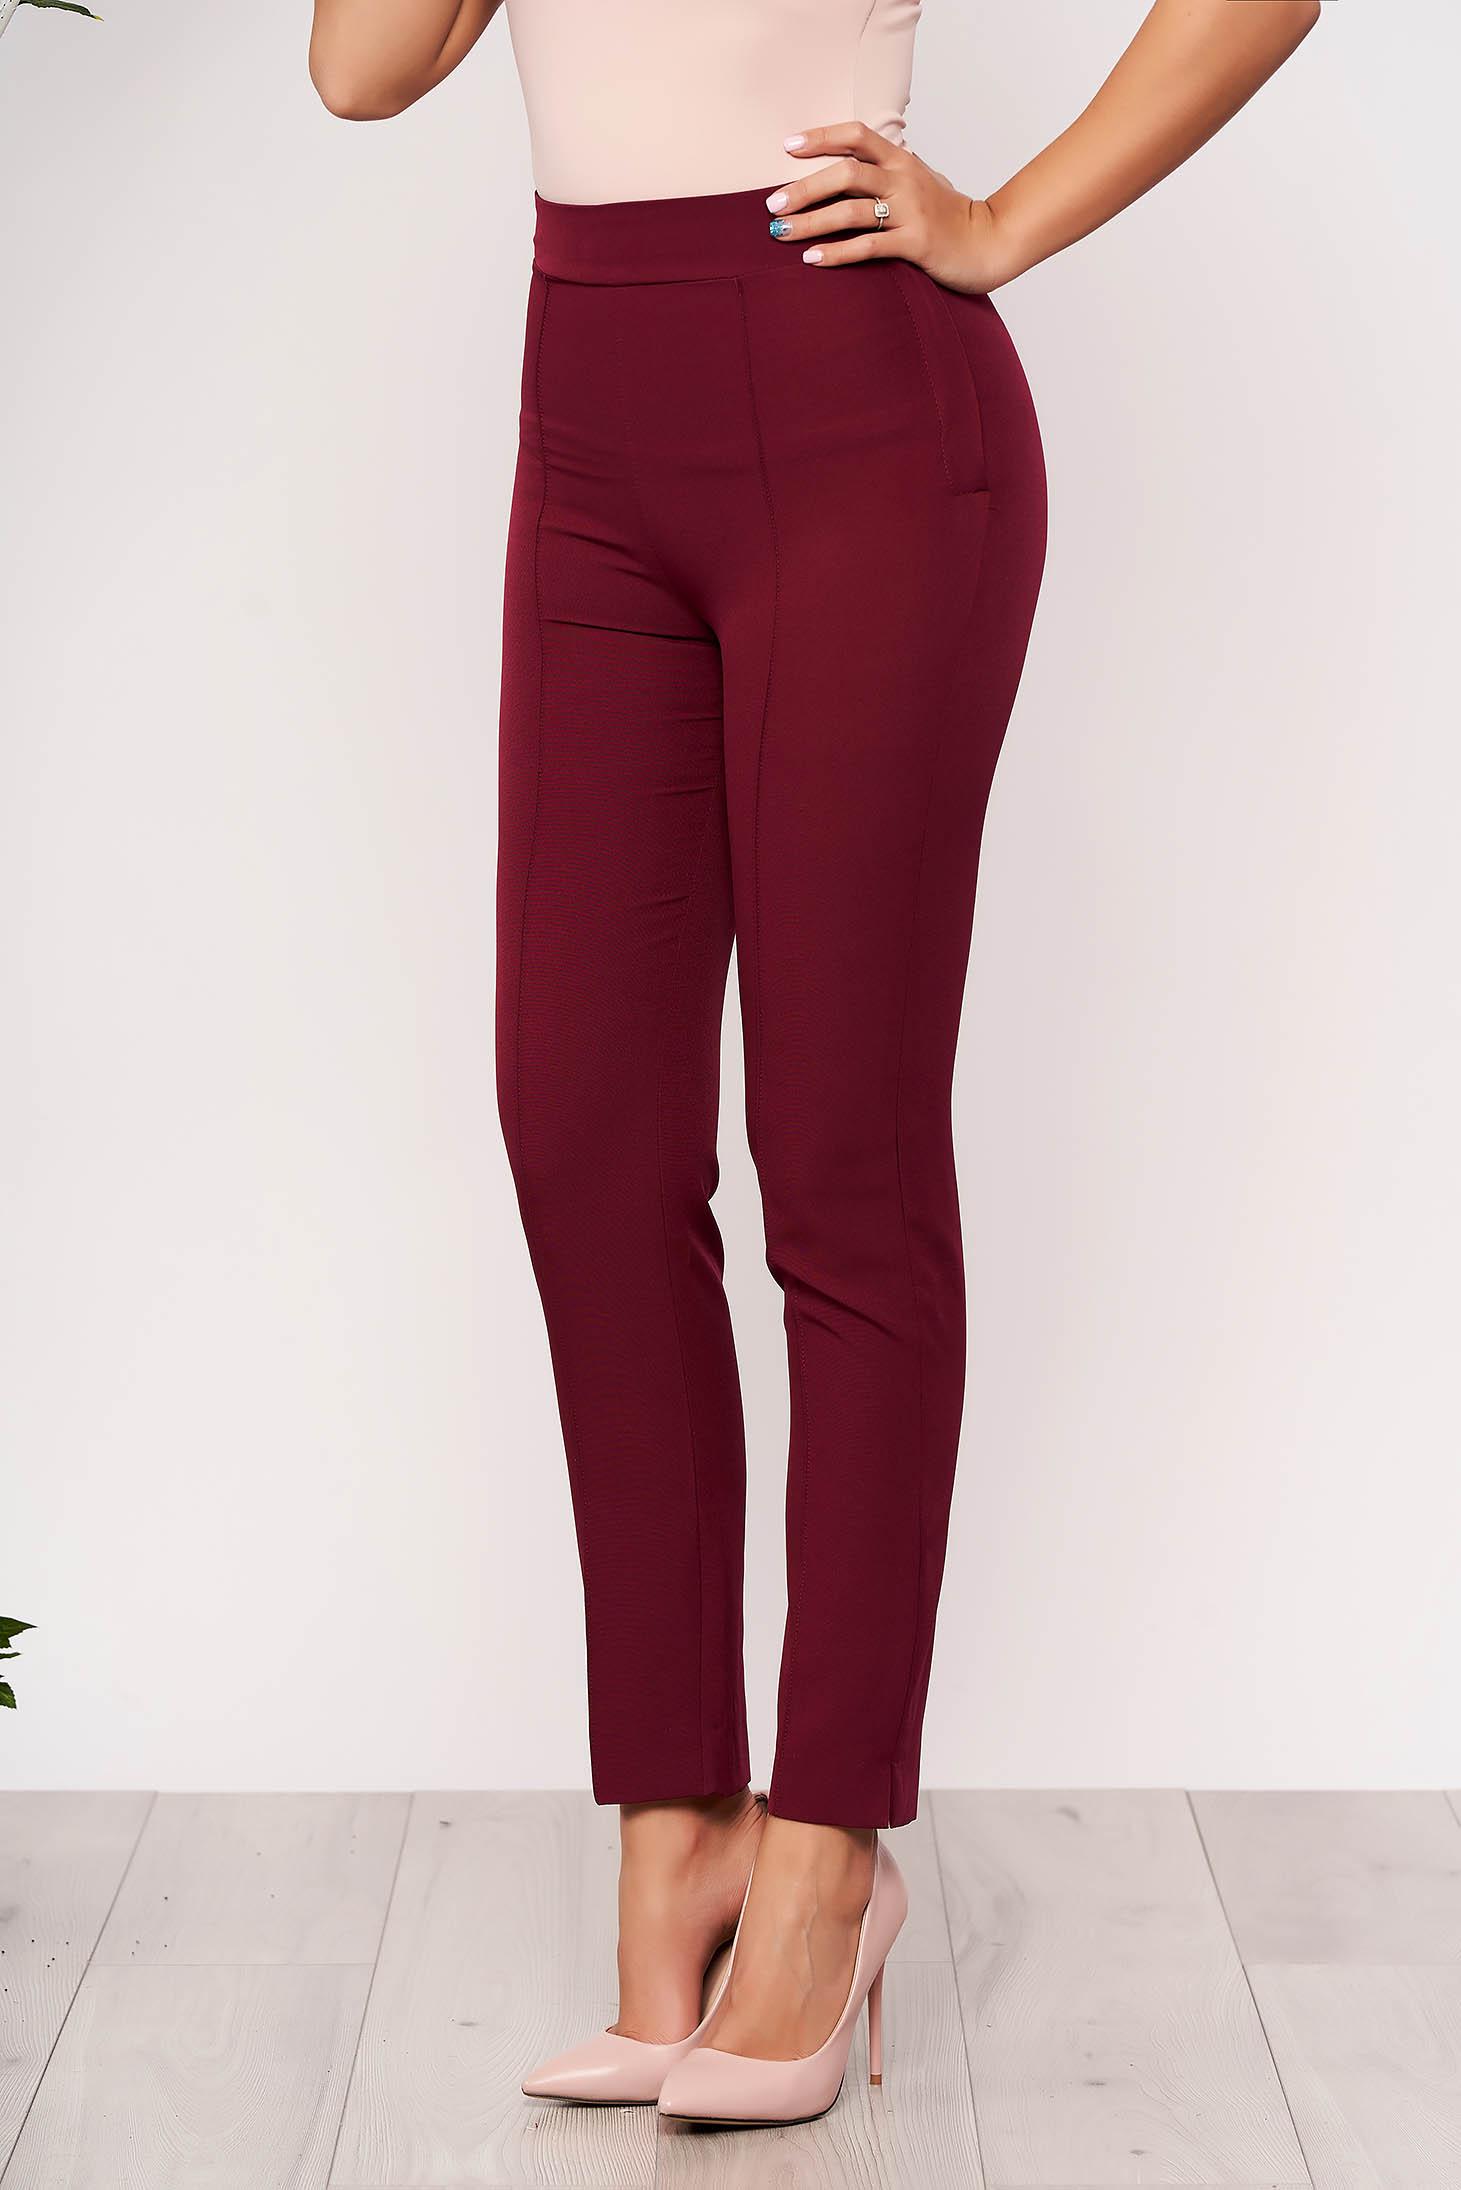 Pantaloni StarShinerS visinii office conici din material usor elastic cu talie inalta